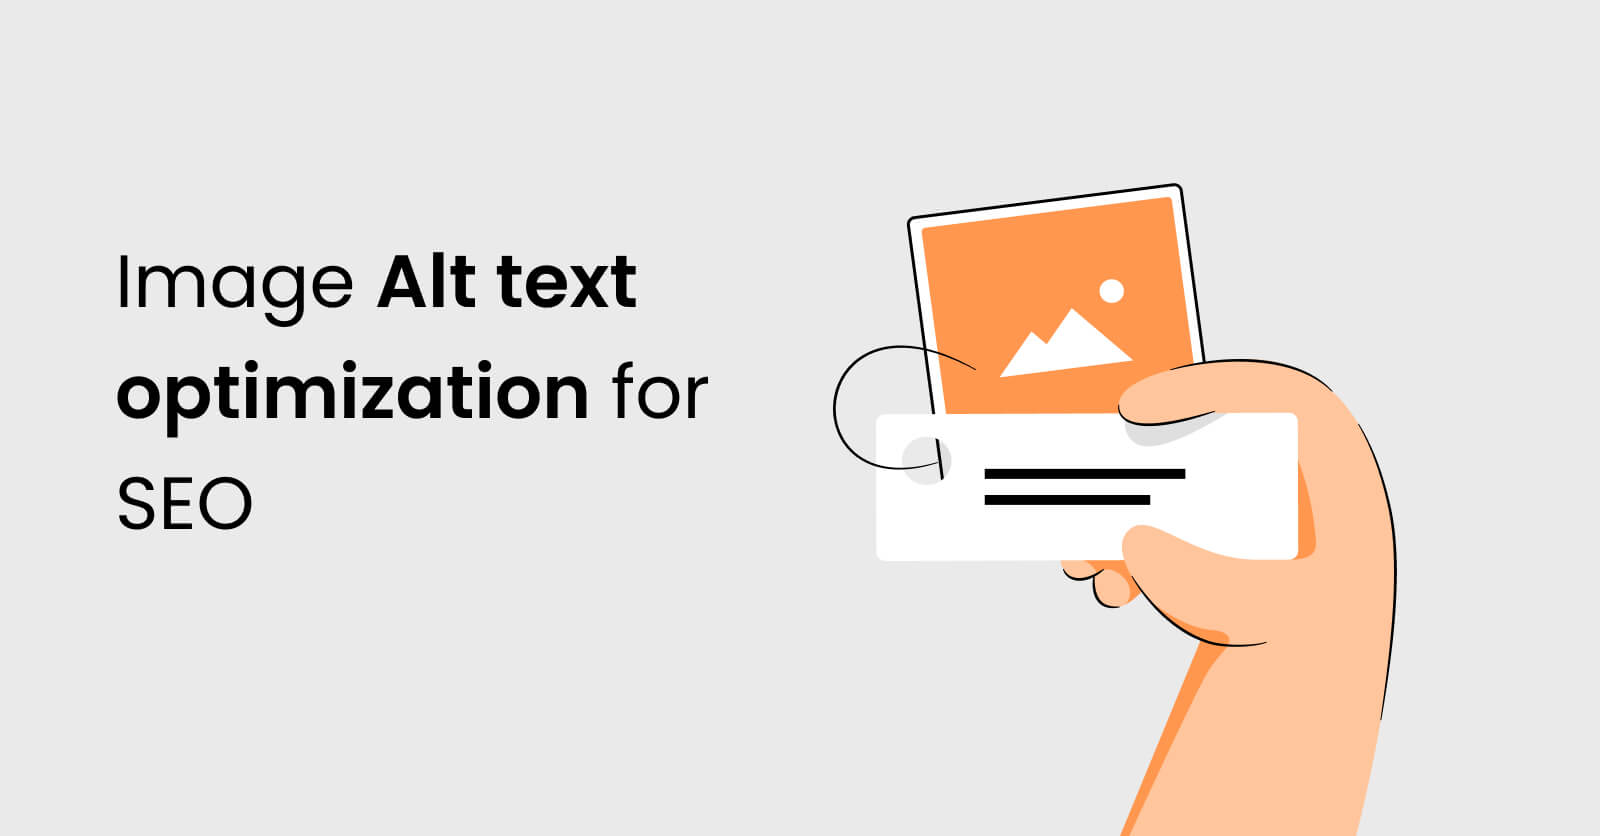 Image Alt text optimization for SEO